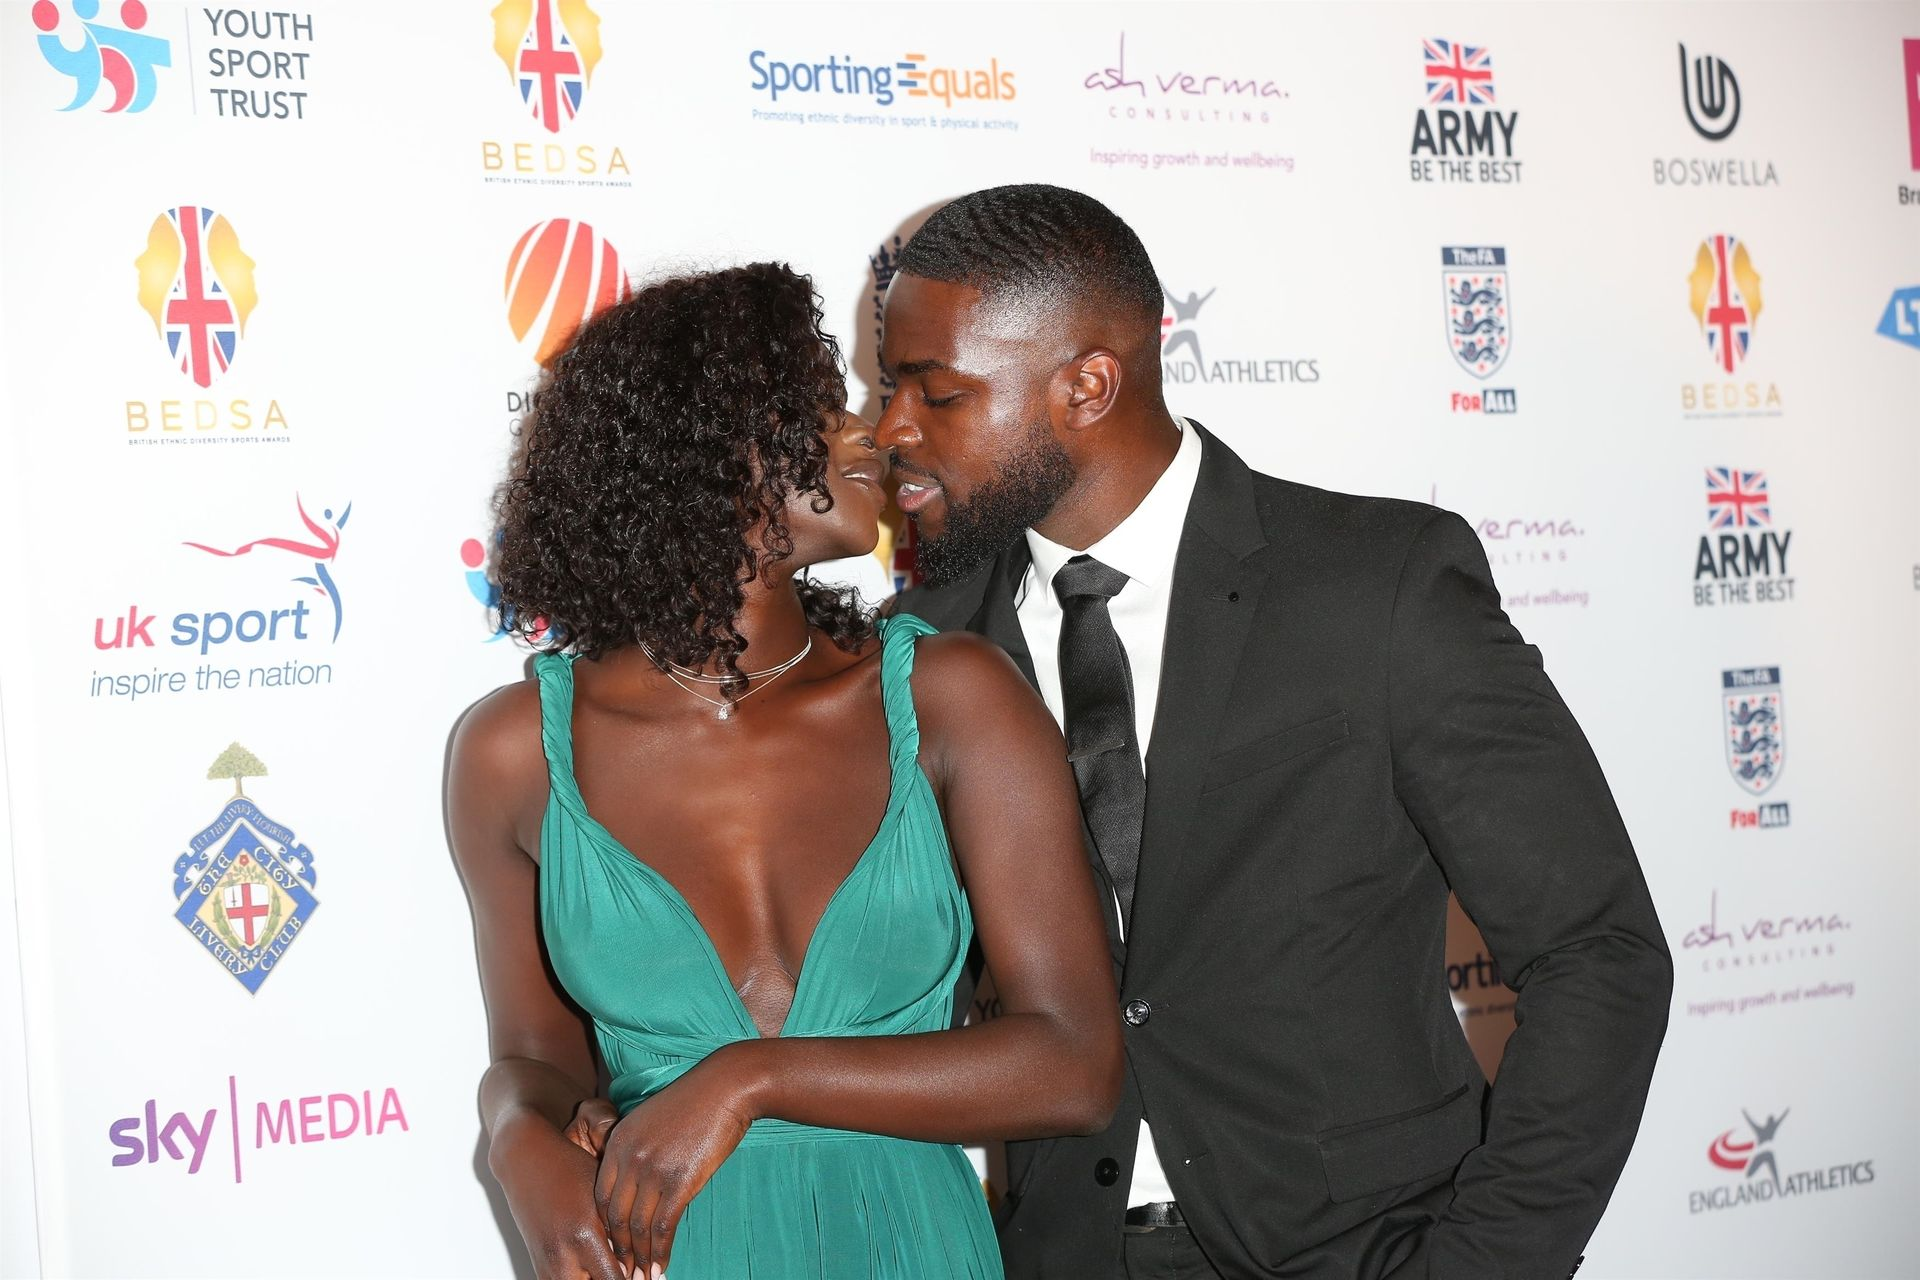 Mike Boateng & Priscilla Anyabu Are Seen At British Ethnic Diversity Sports Awards 0060